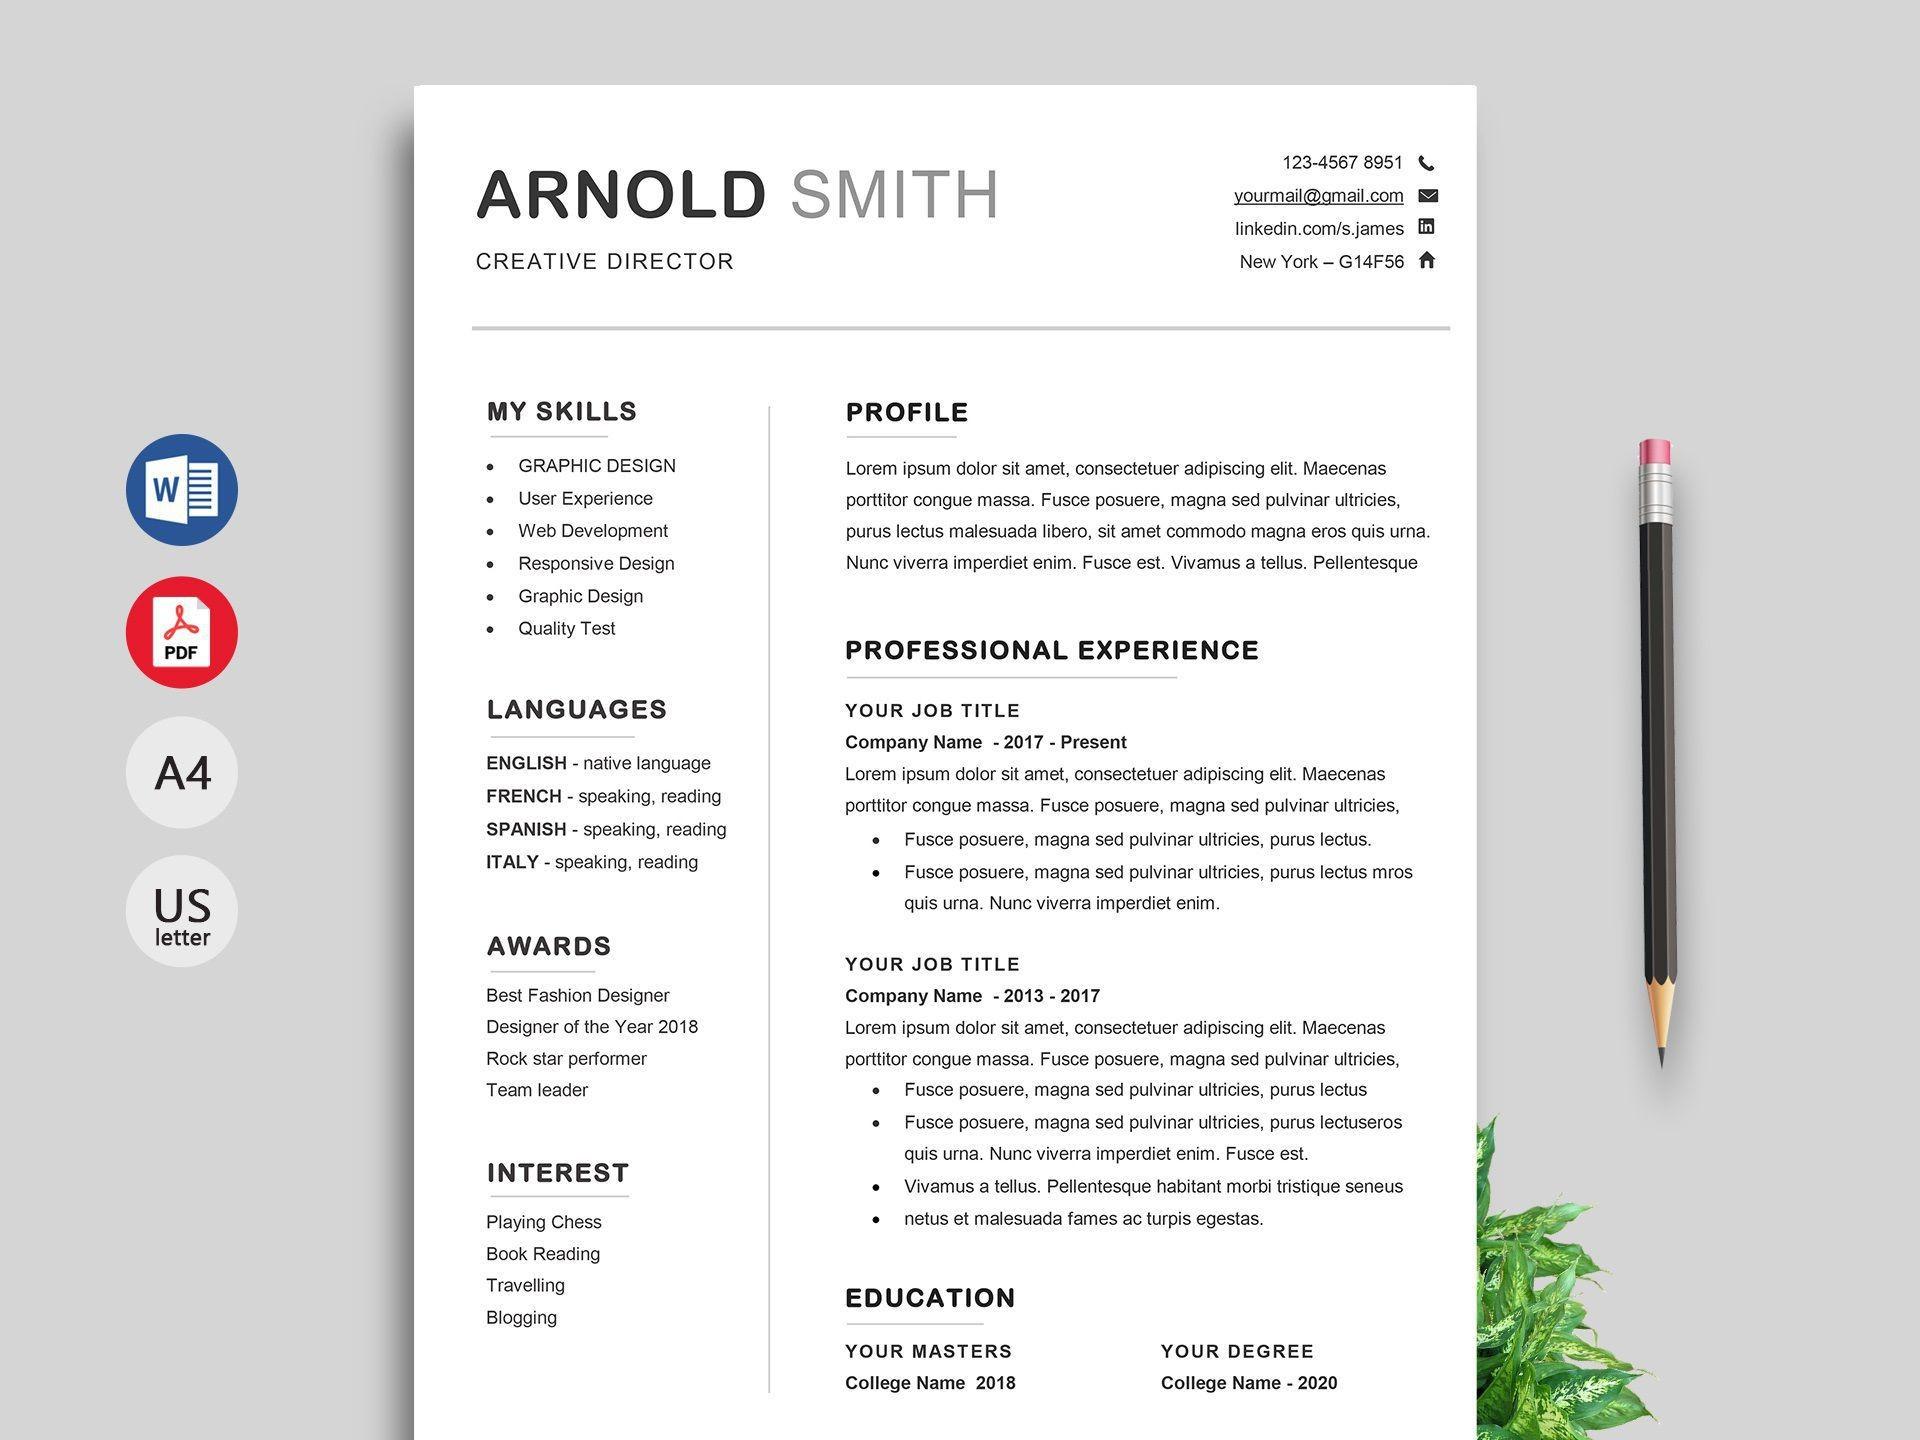 001 Unique Download Resume Sample Free High Resolution  Teacher Cv Graphic Designer Word Format Nurse Template1920